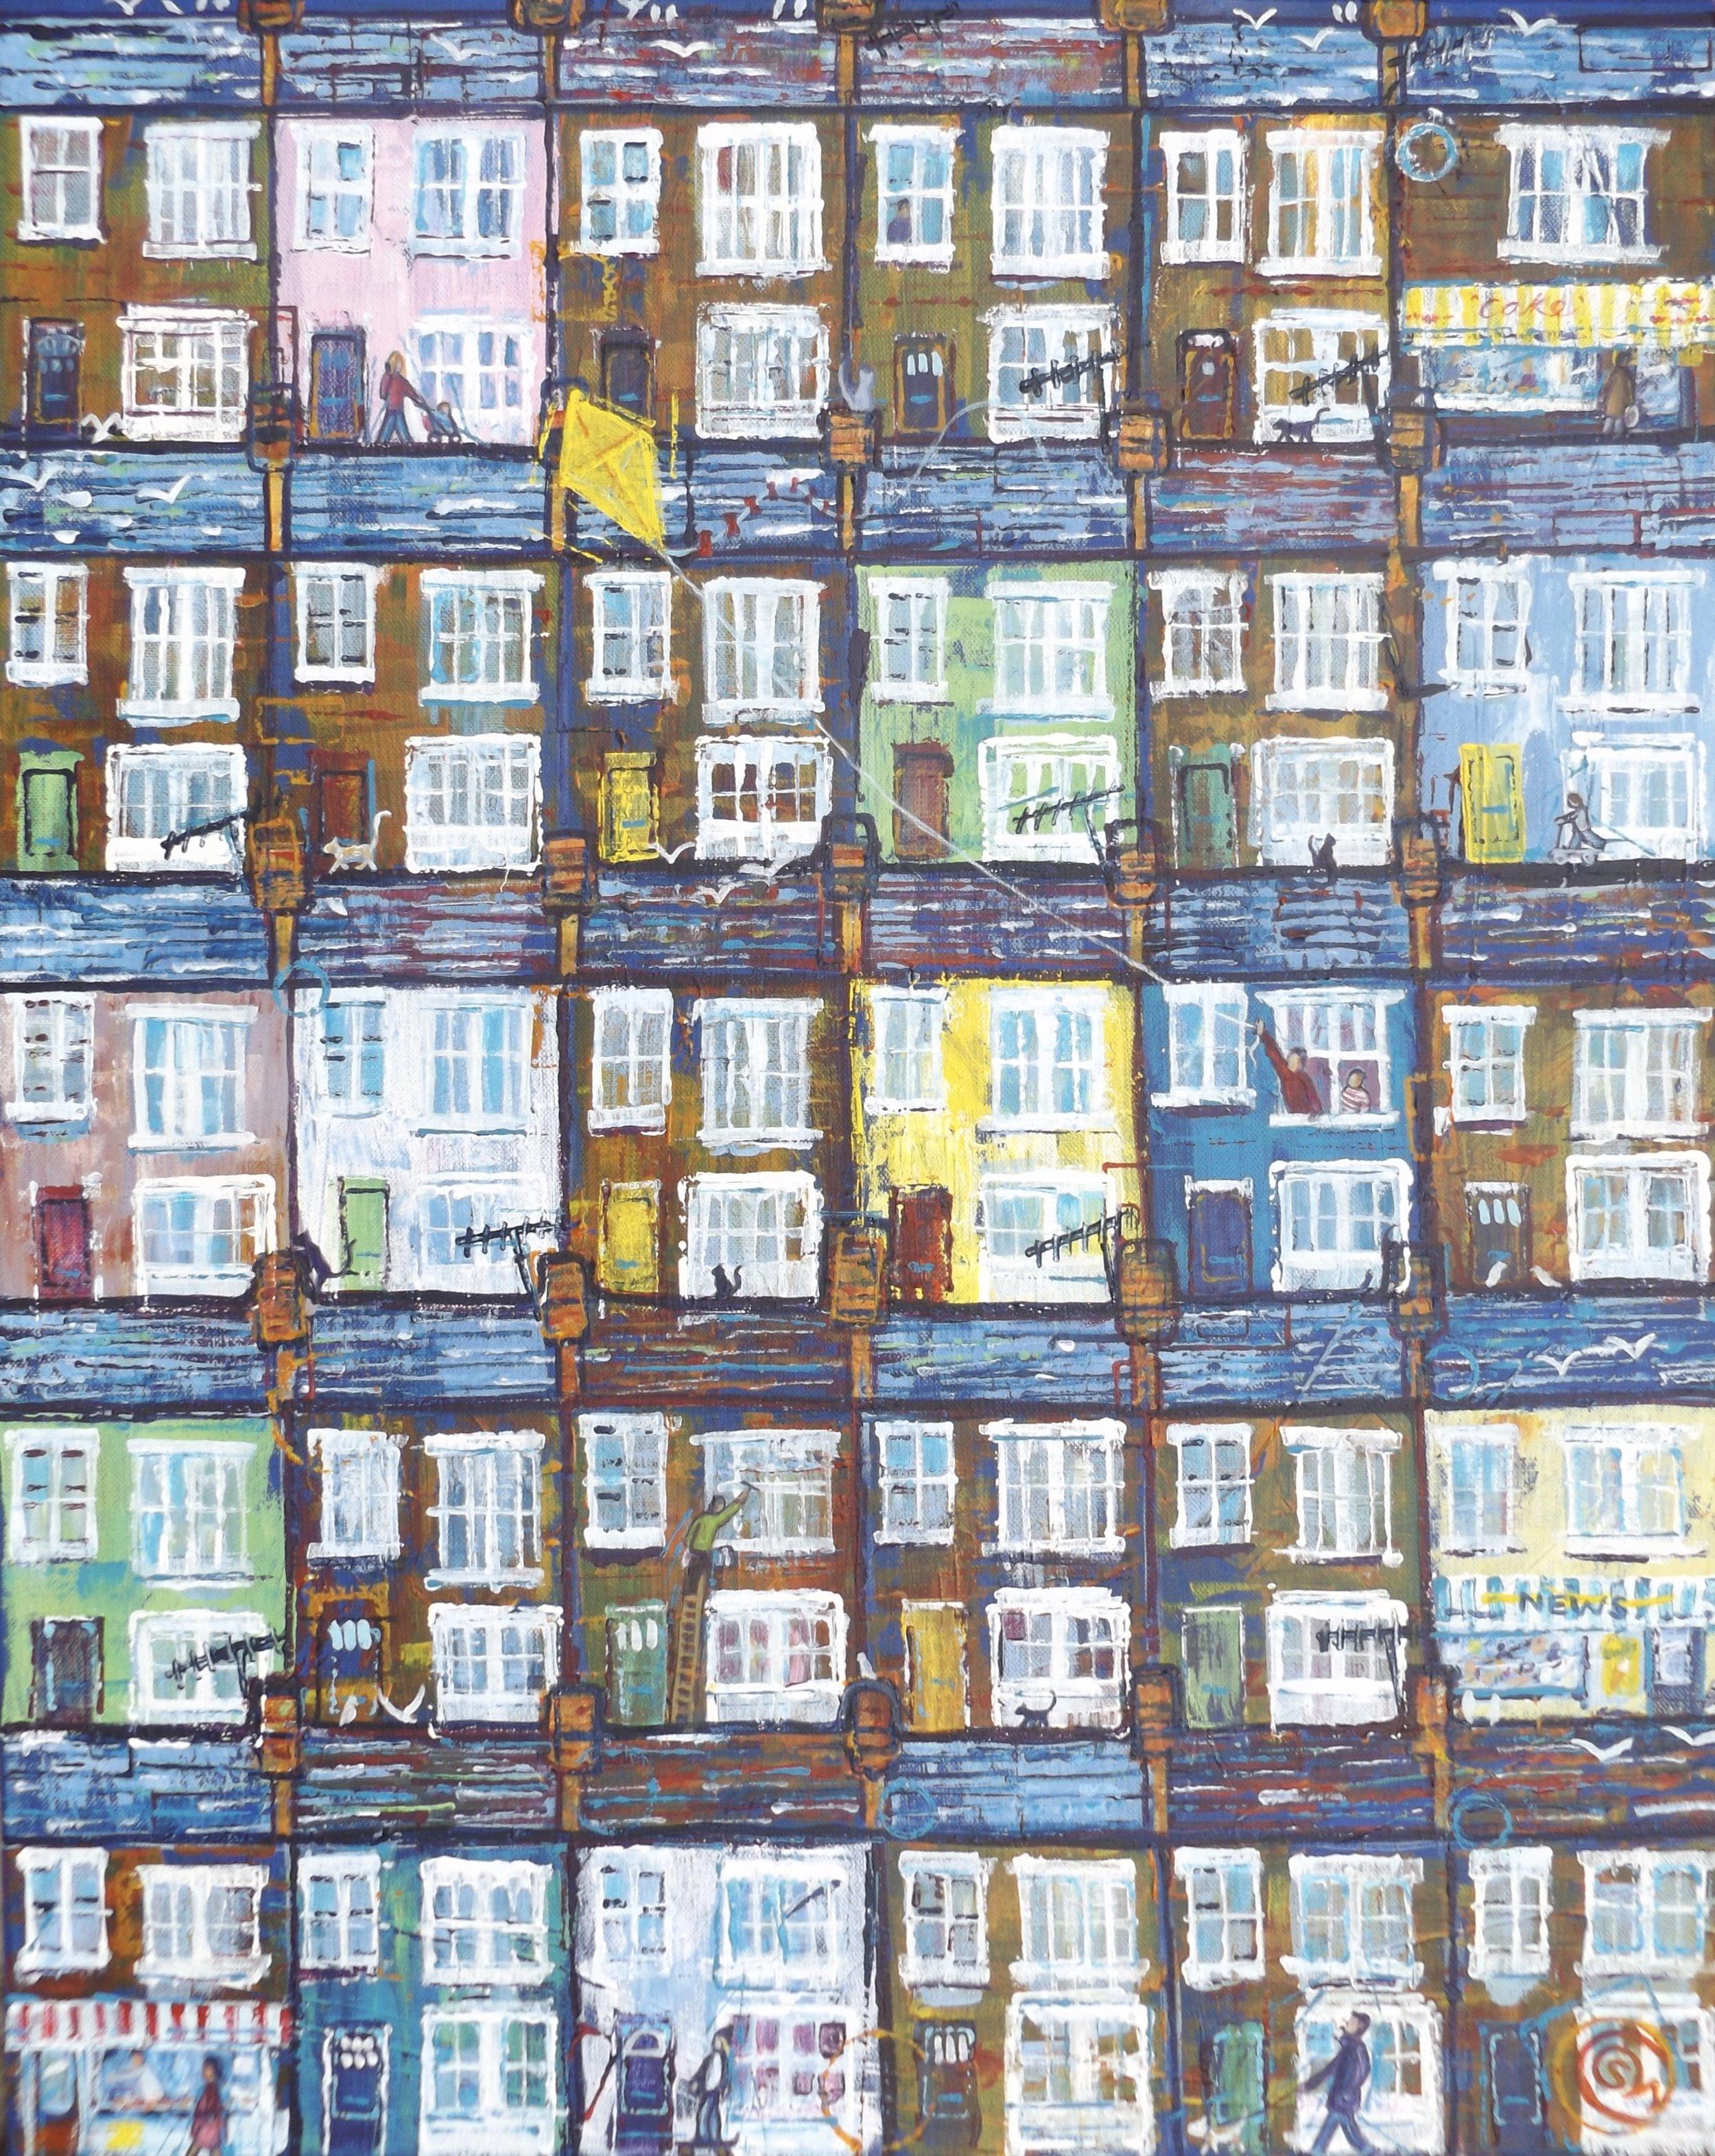 'Flight of Fantasy' Acrylic on canvas (61cm x 46cm) urban life in a seaside town